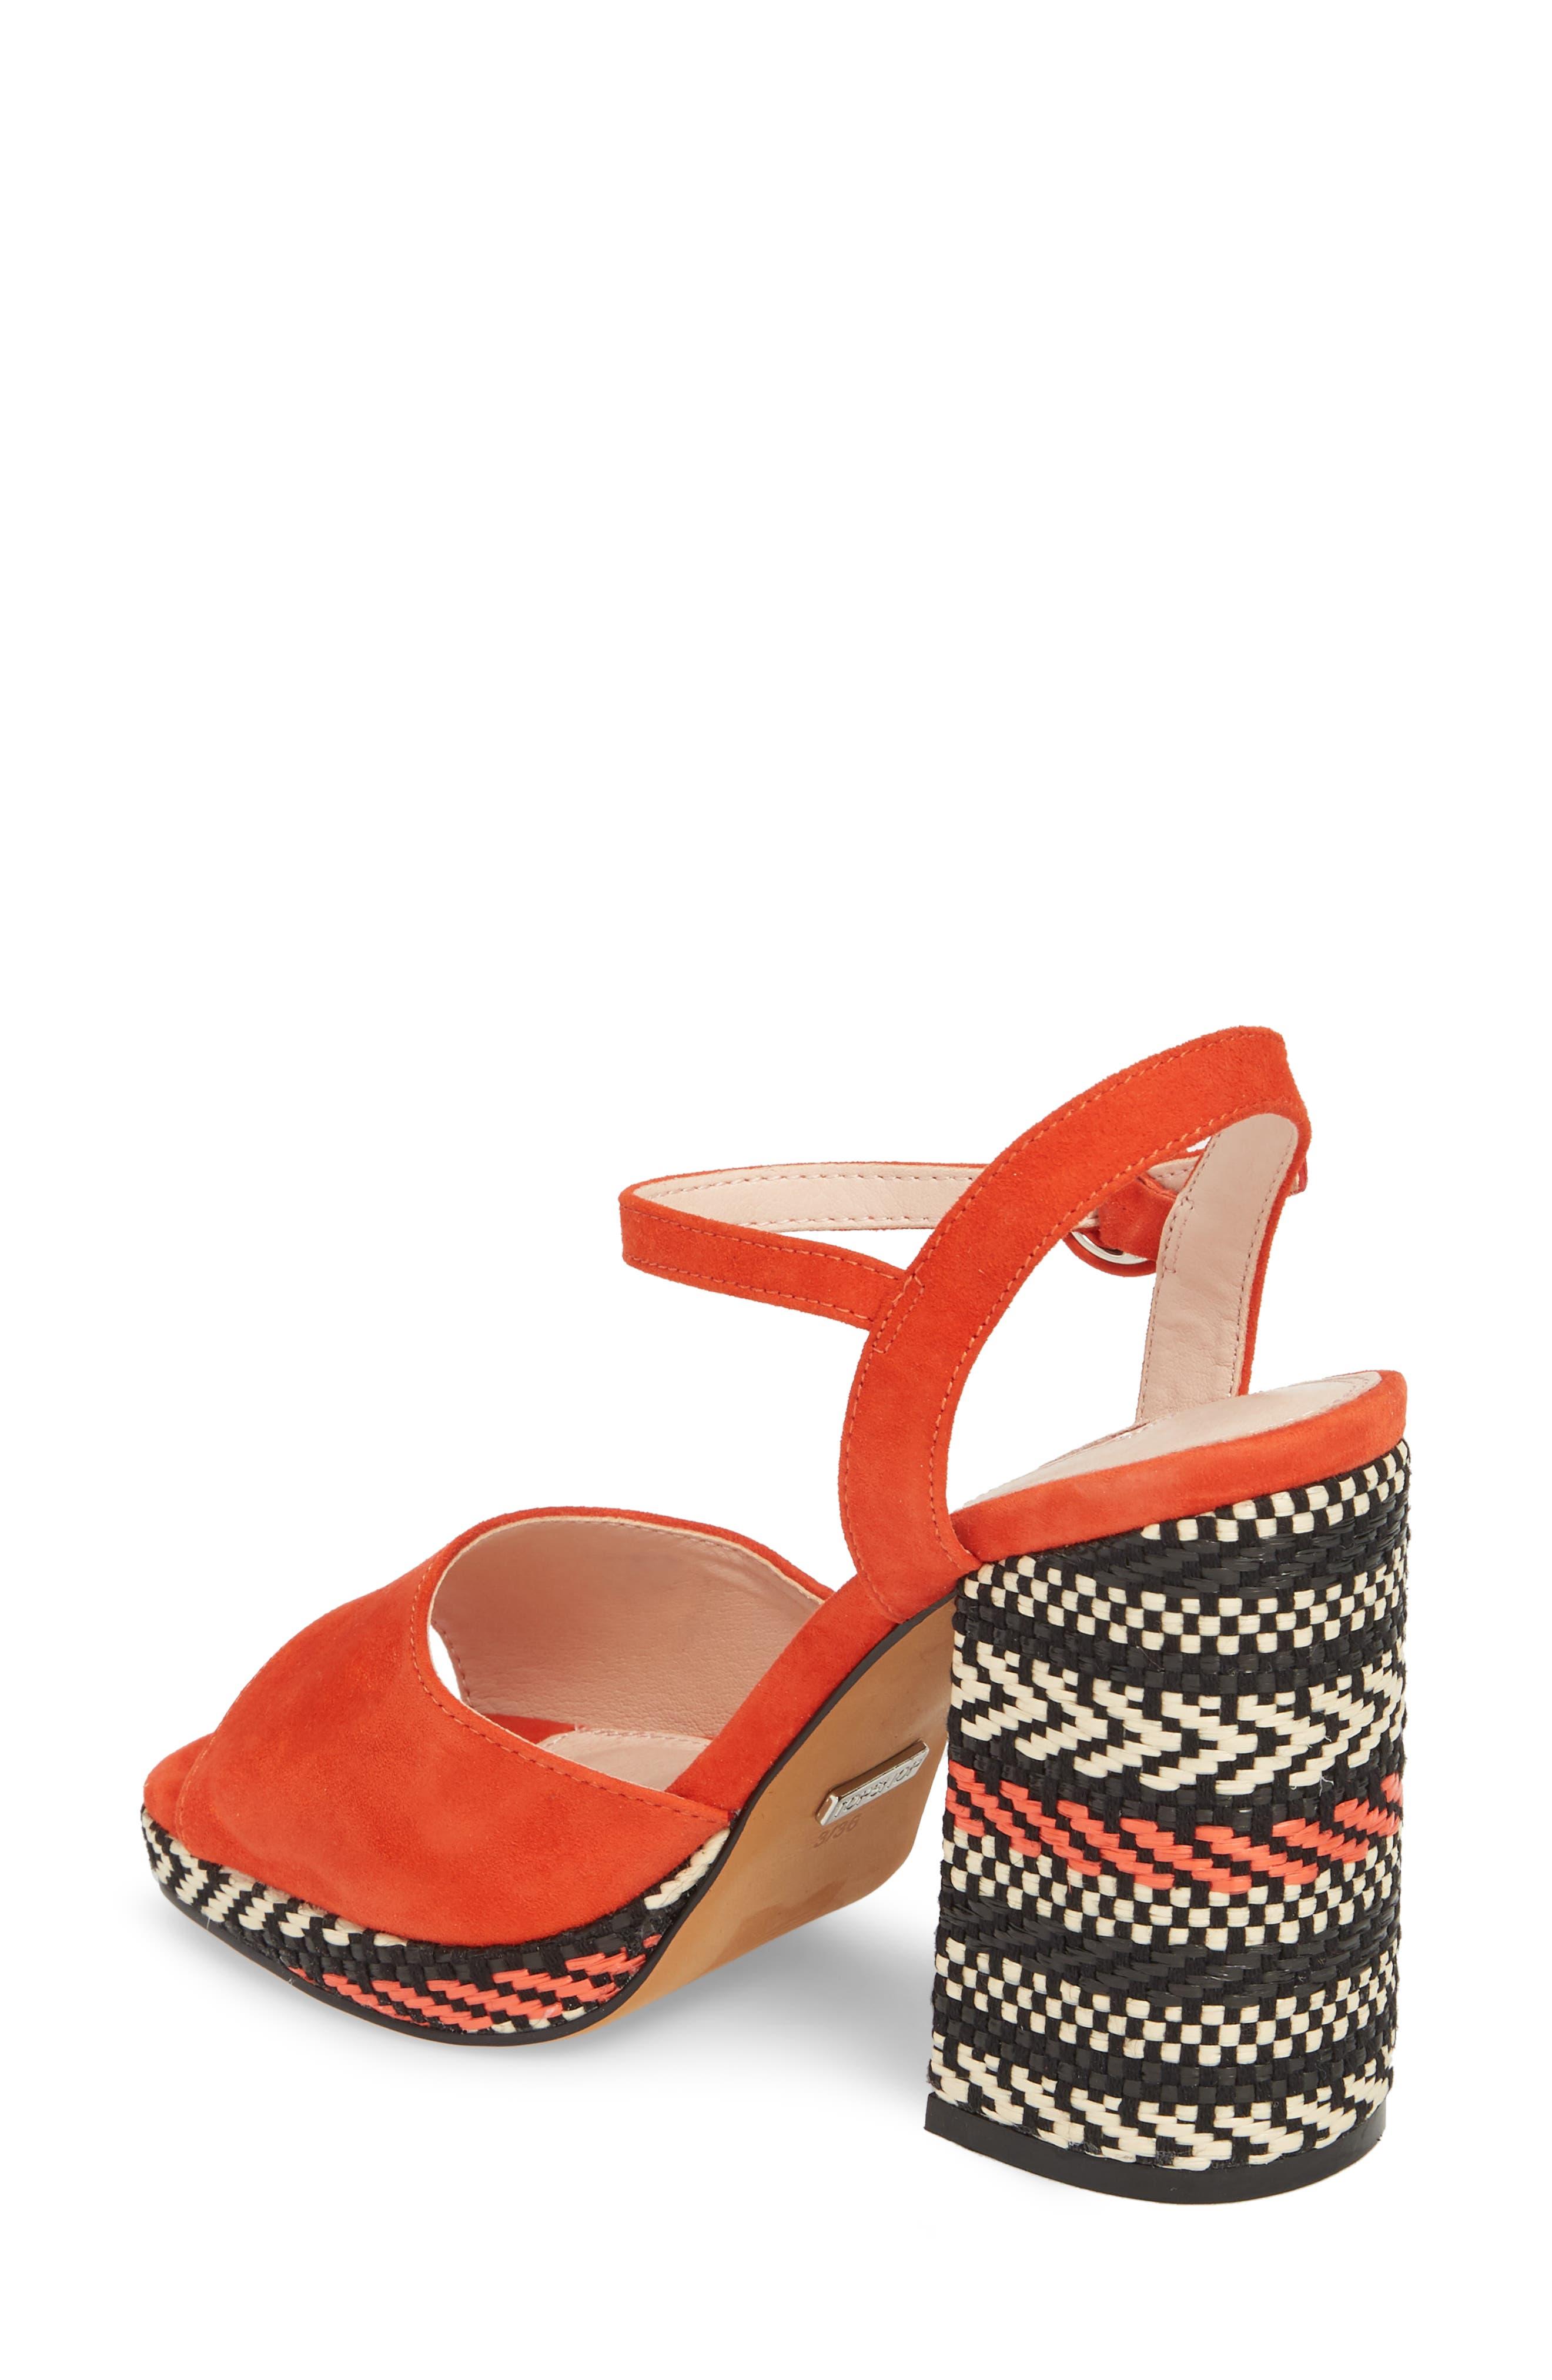 Laura Woven Block Heel Sandal,                             Alternate thumbnail 4, color,